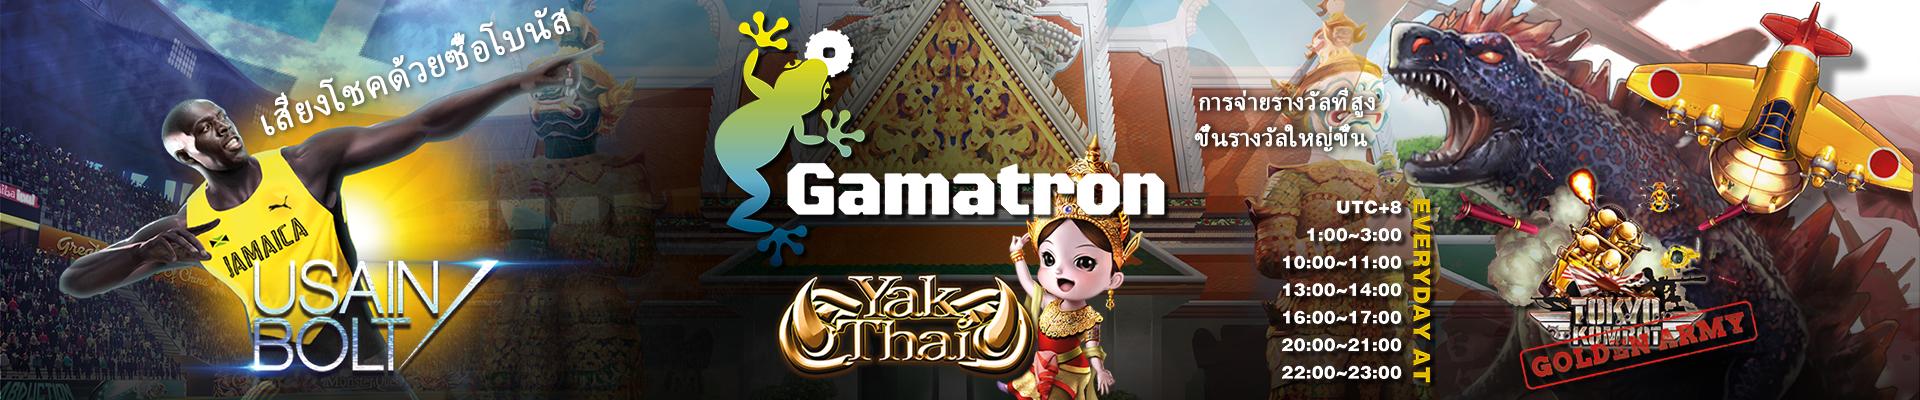 Gamatron Banner